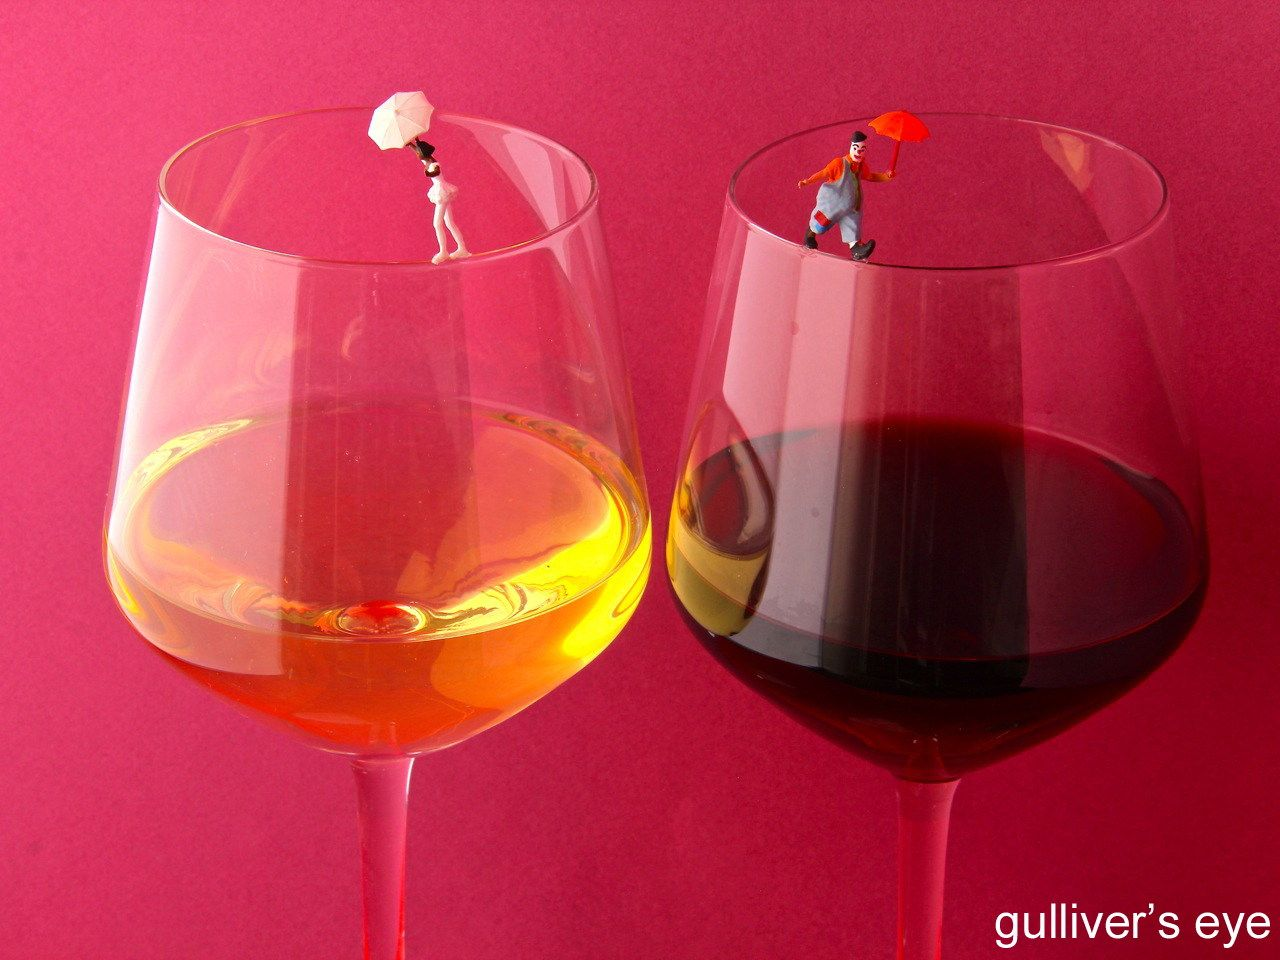 White & Red #creativityfood #foodart #foodartist #foodproduct #wine